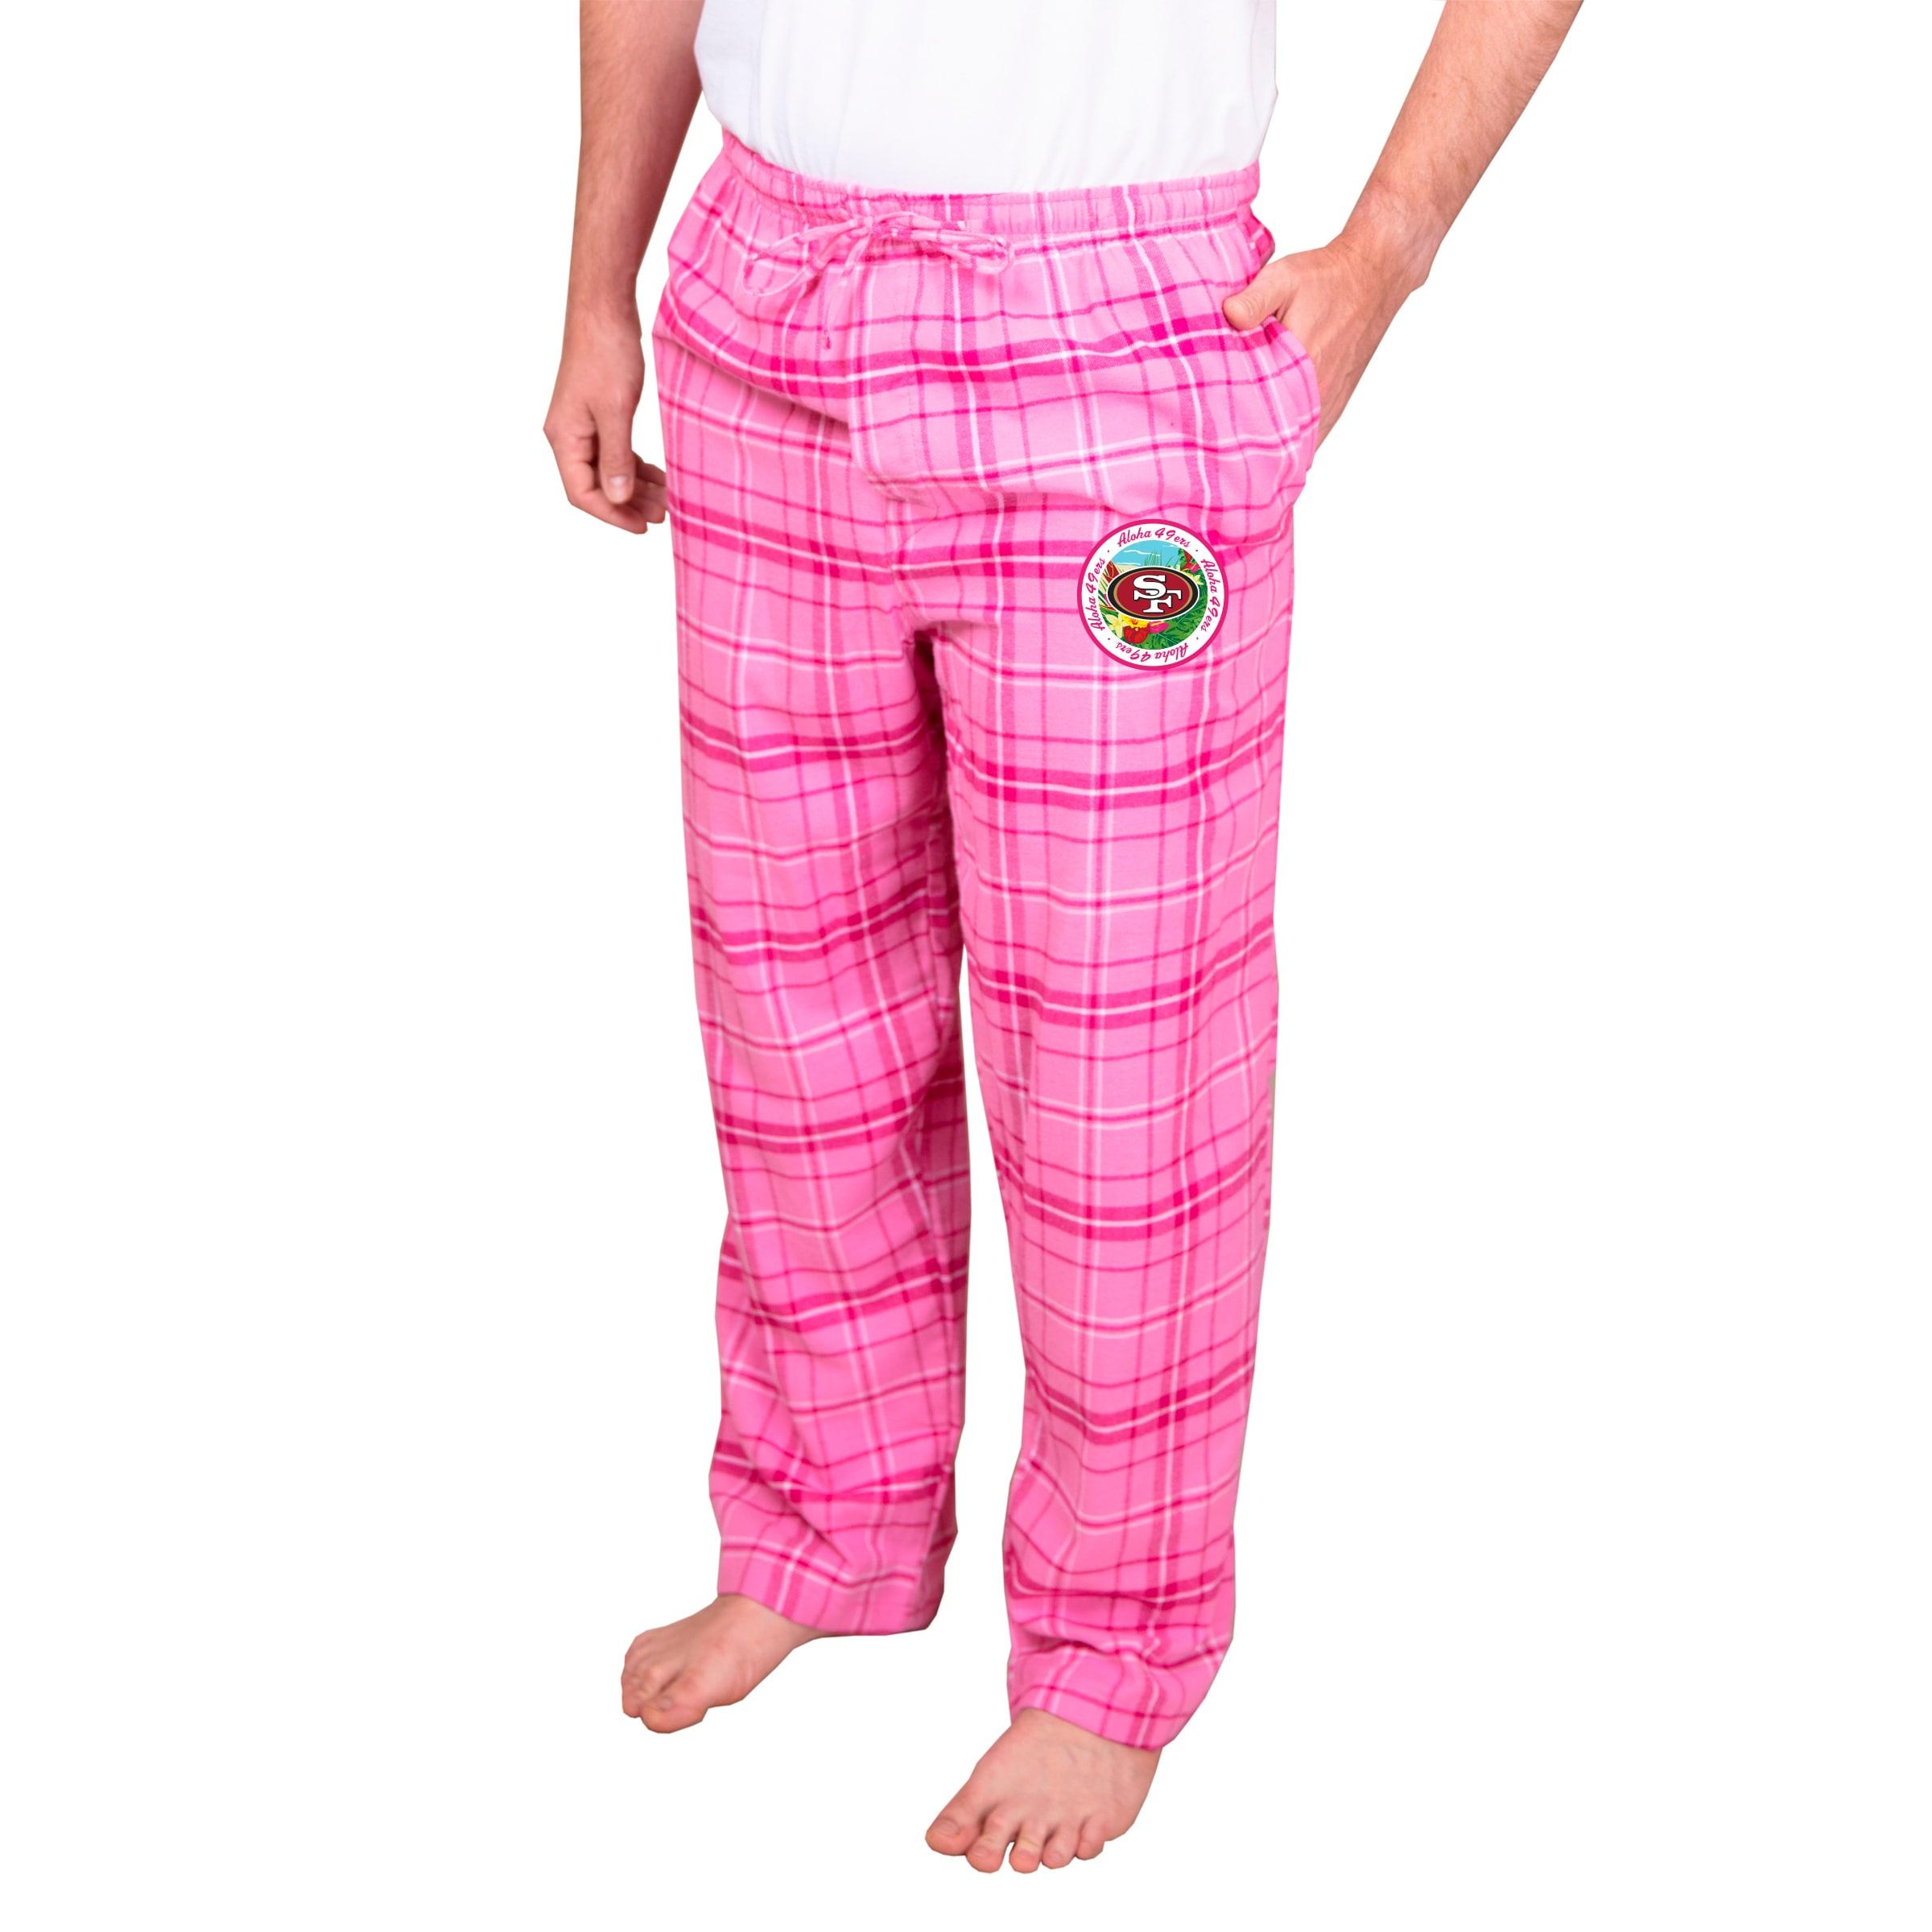 San Francisco 49ers Concepts Sport Ultimate Pants - Pink